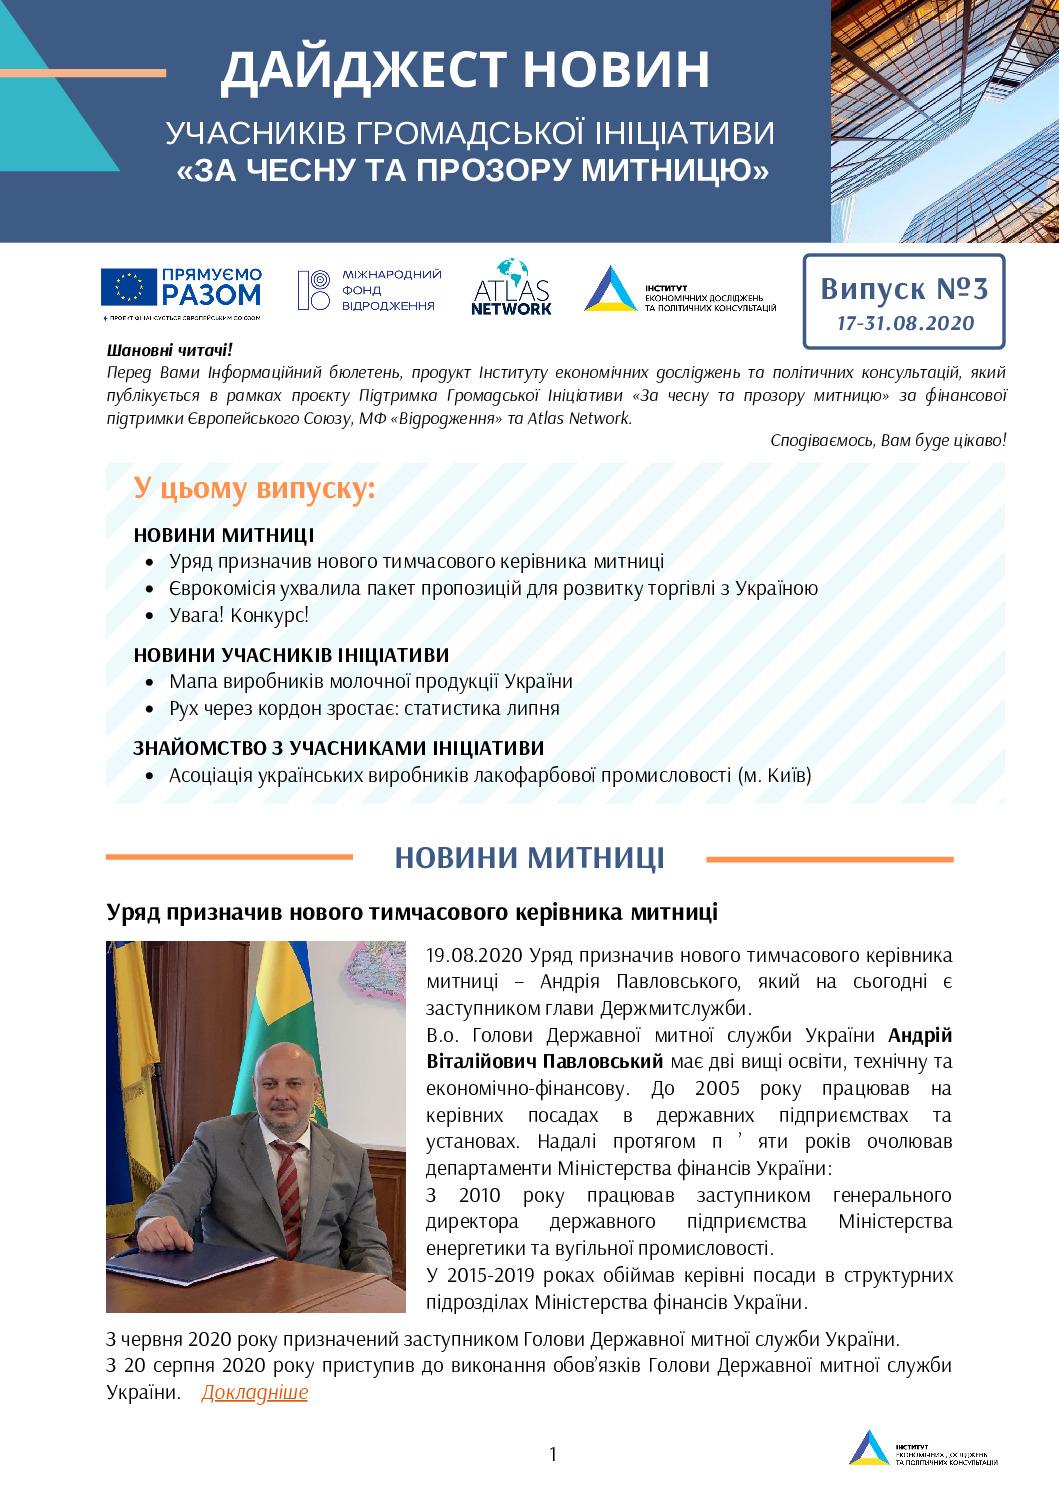 thumbnail of Дайджест новин_№3 (17-31.08.2020)